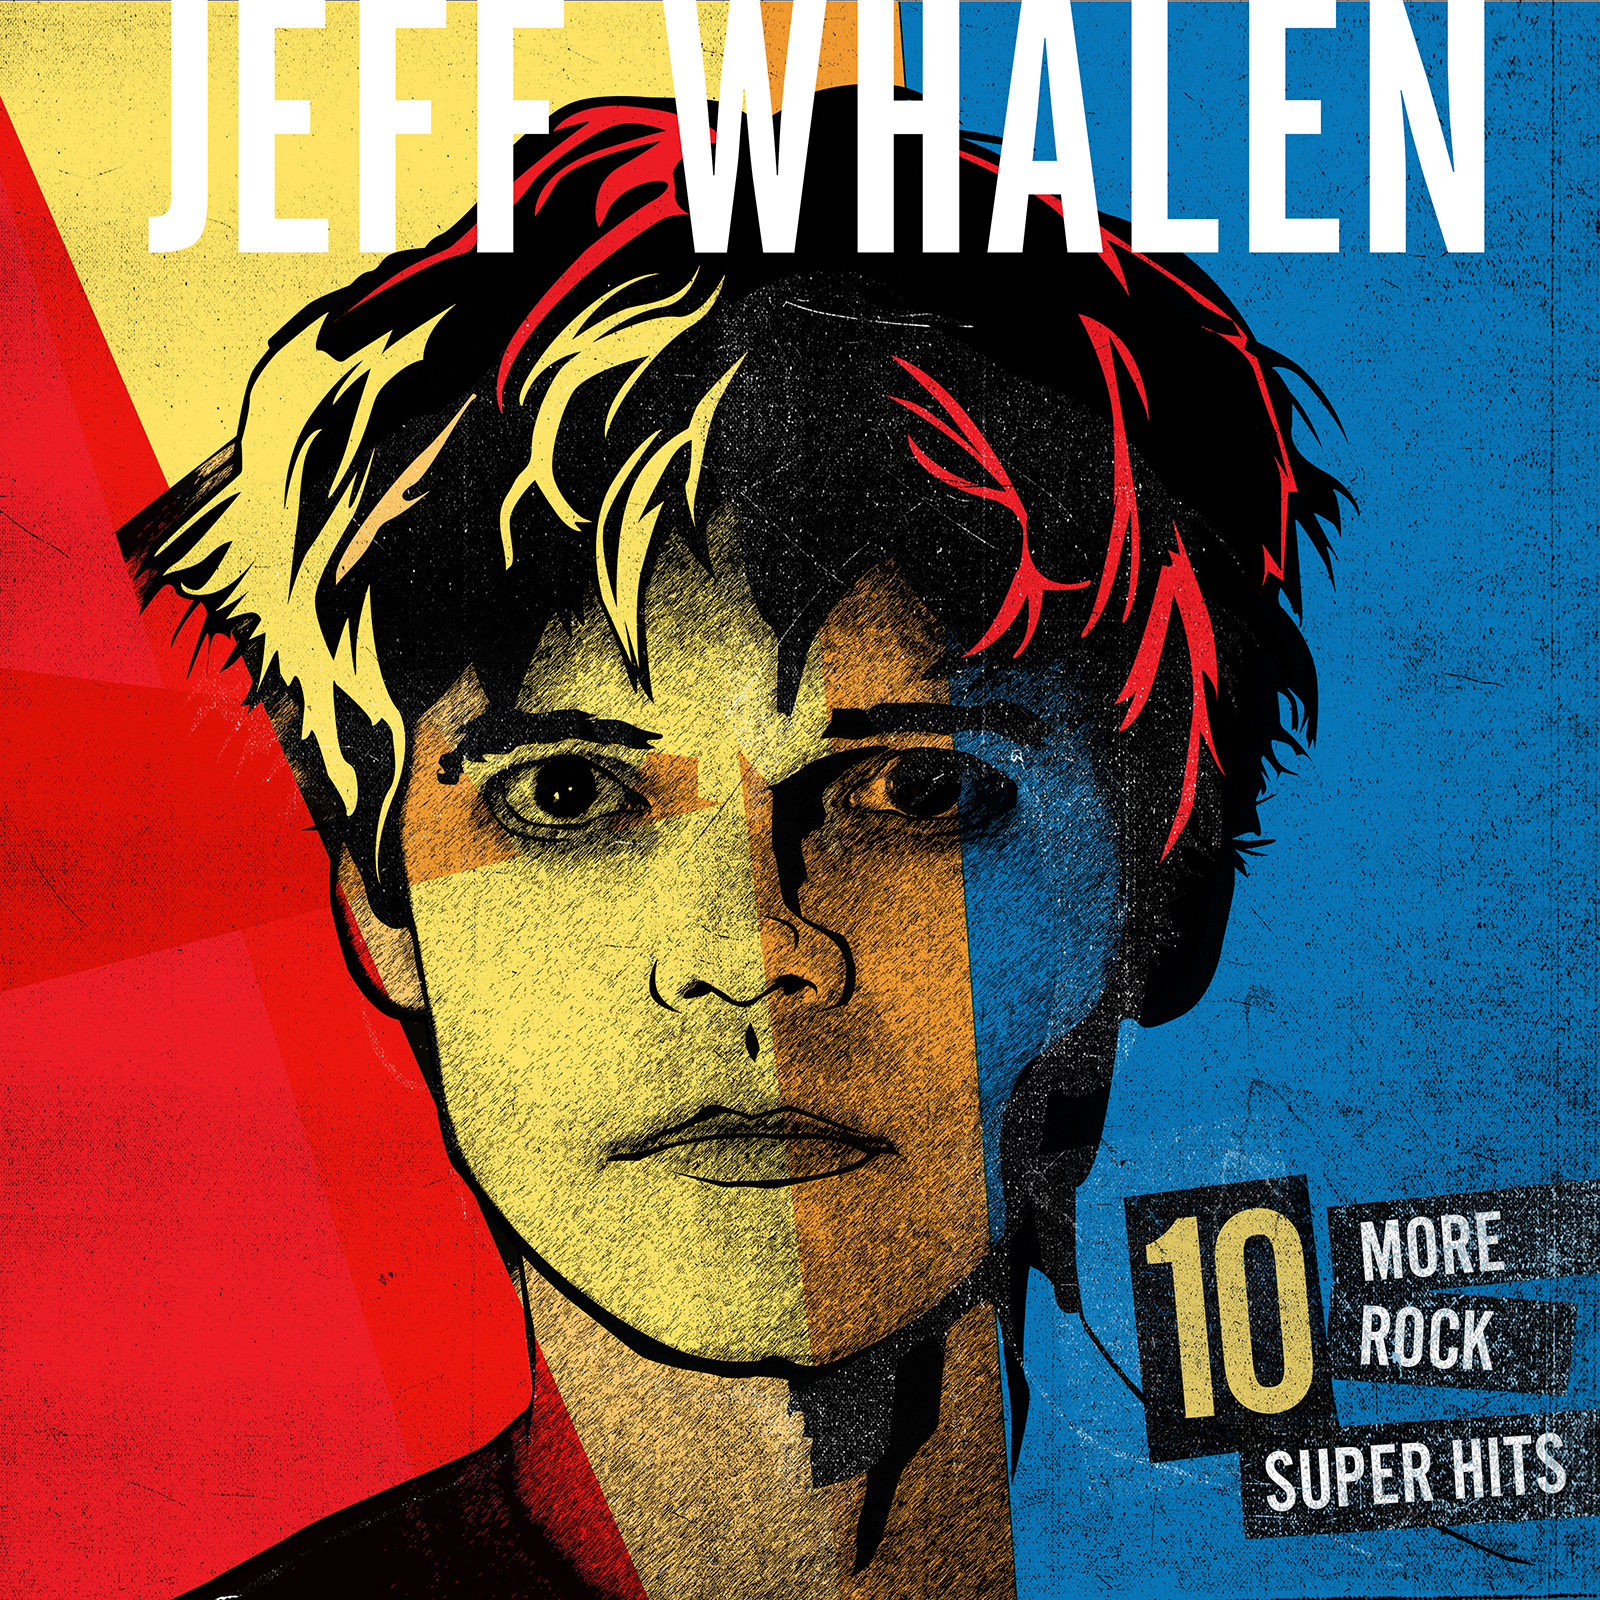 JW Cover FINAL copy.jpg